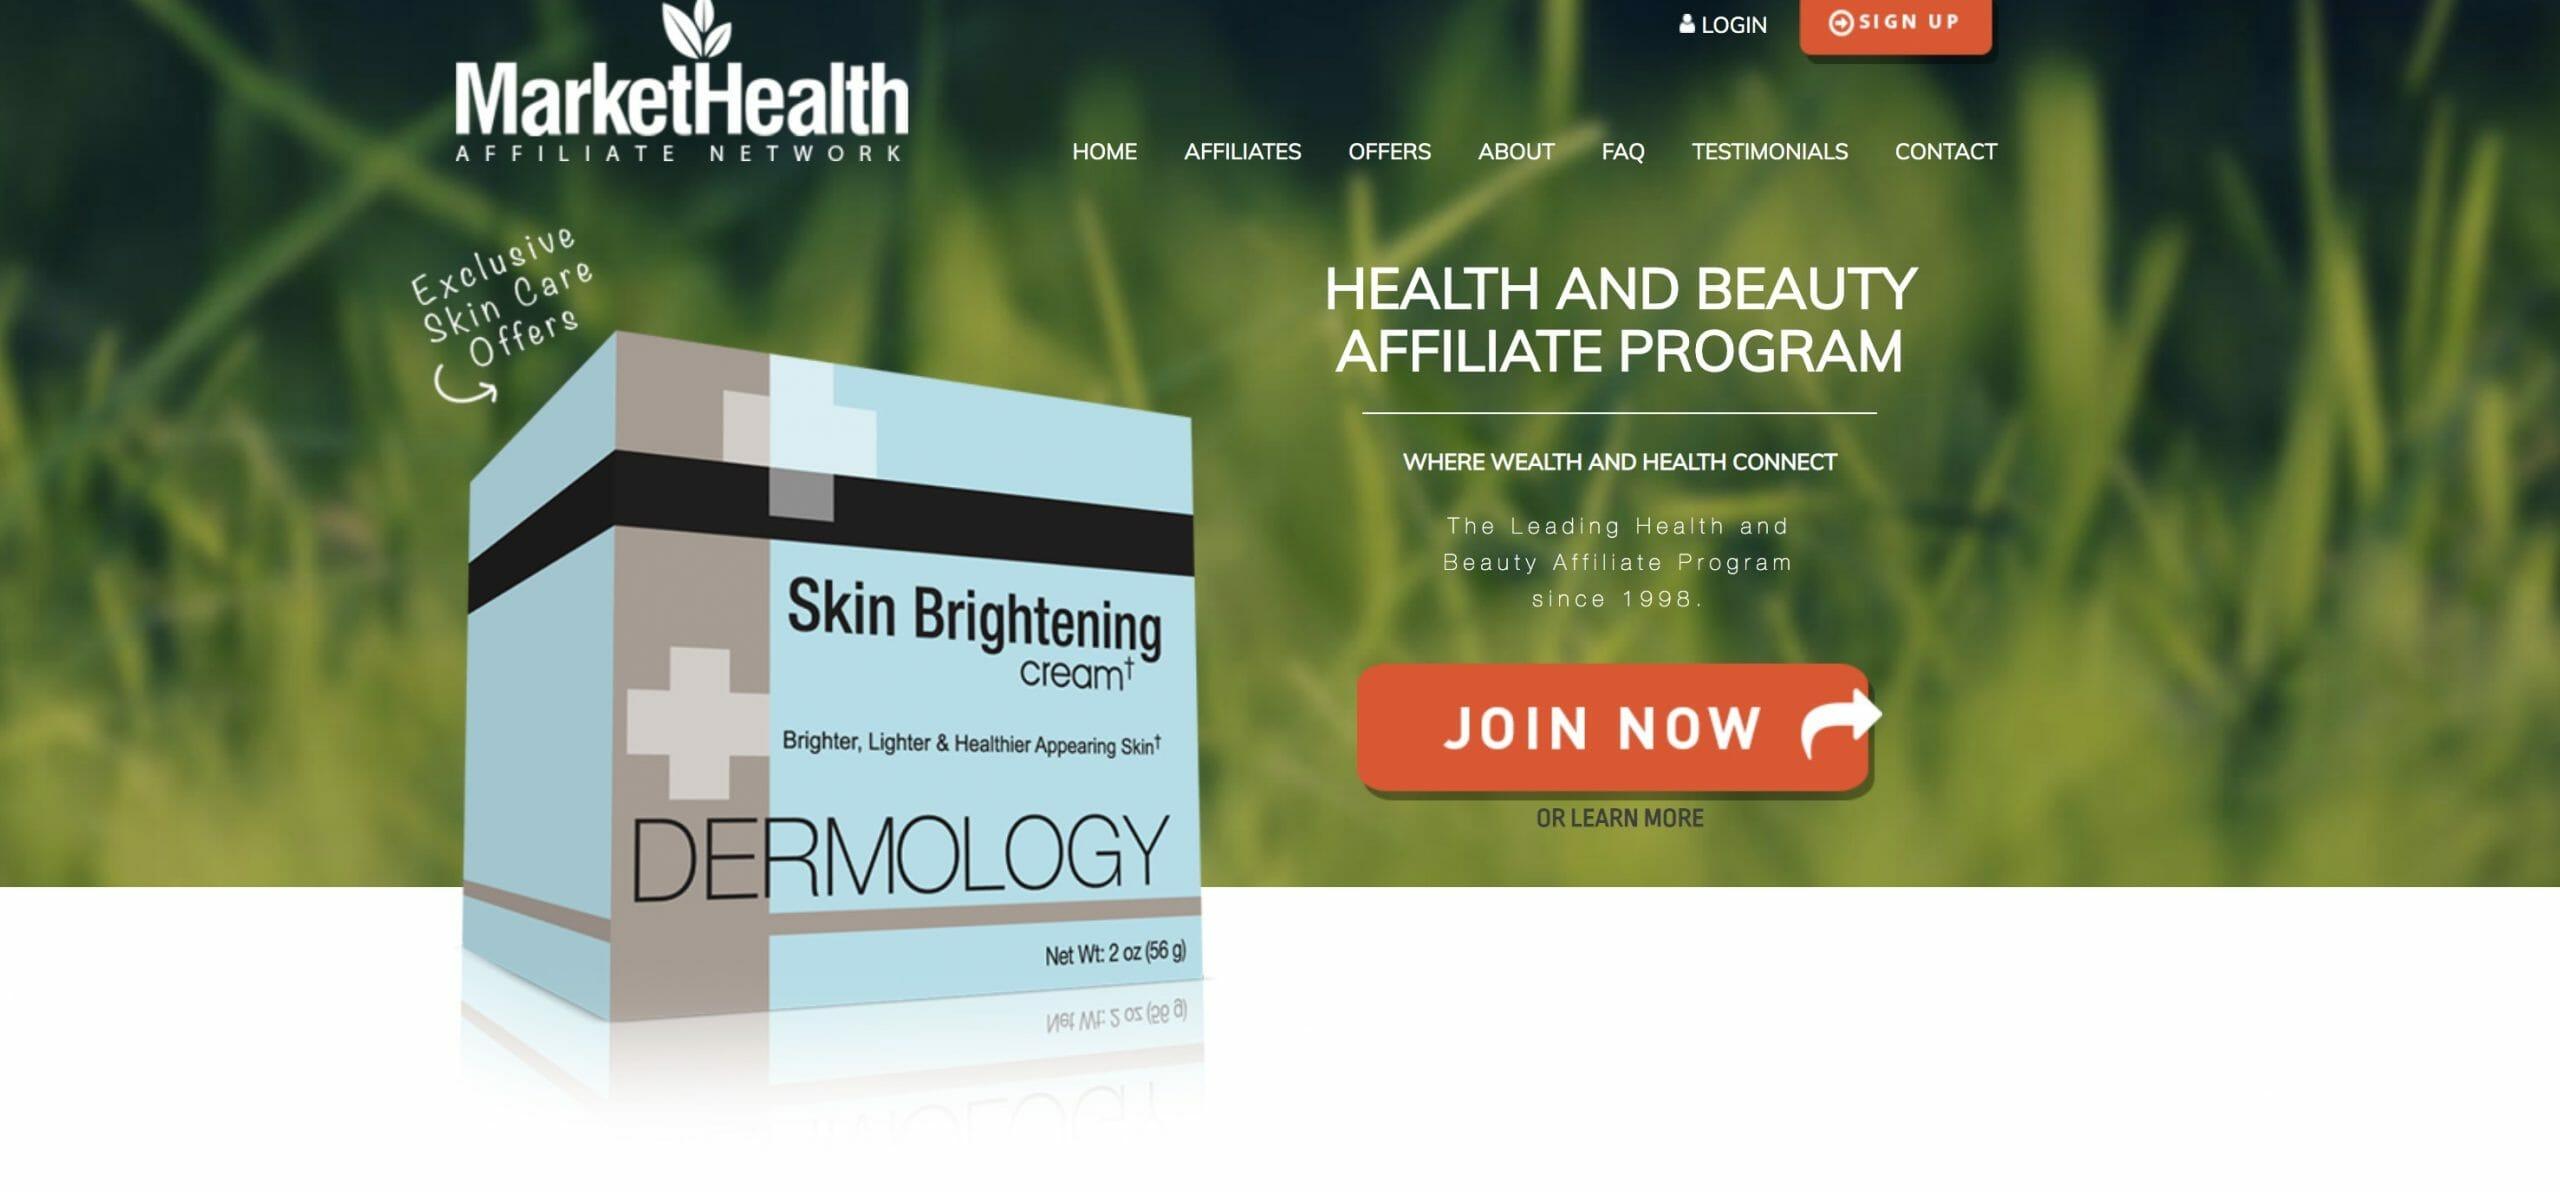 markethealth affiliate network home screenshot